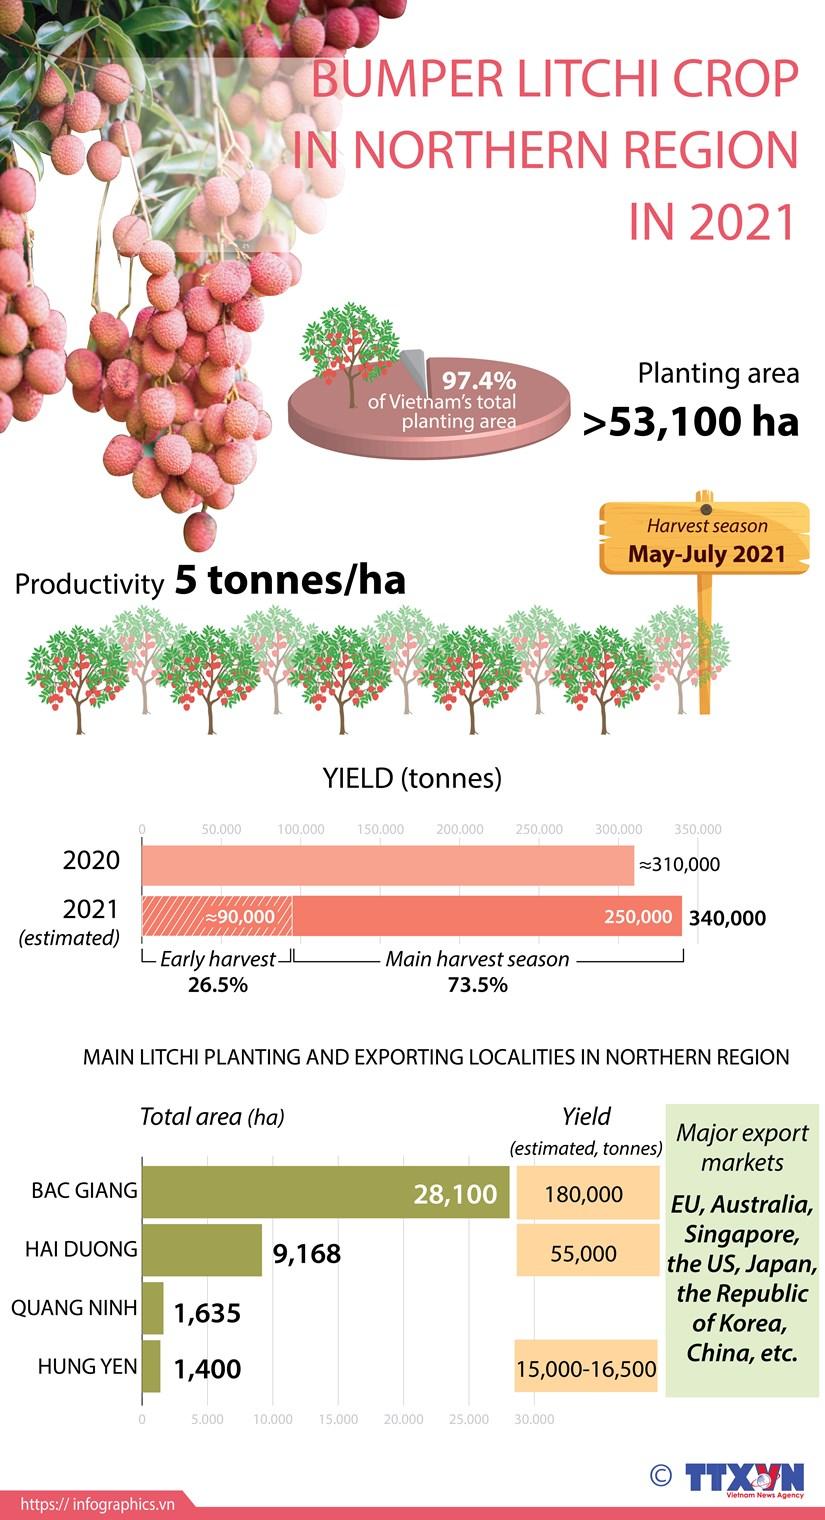 Bumper litchi crop in northern region in 2021 hinh anh 1